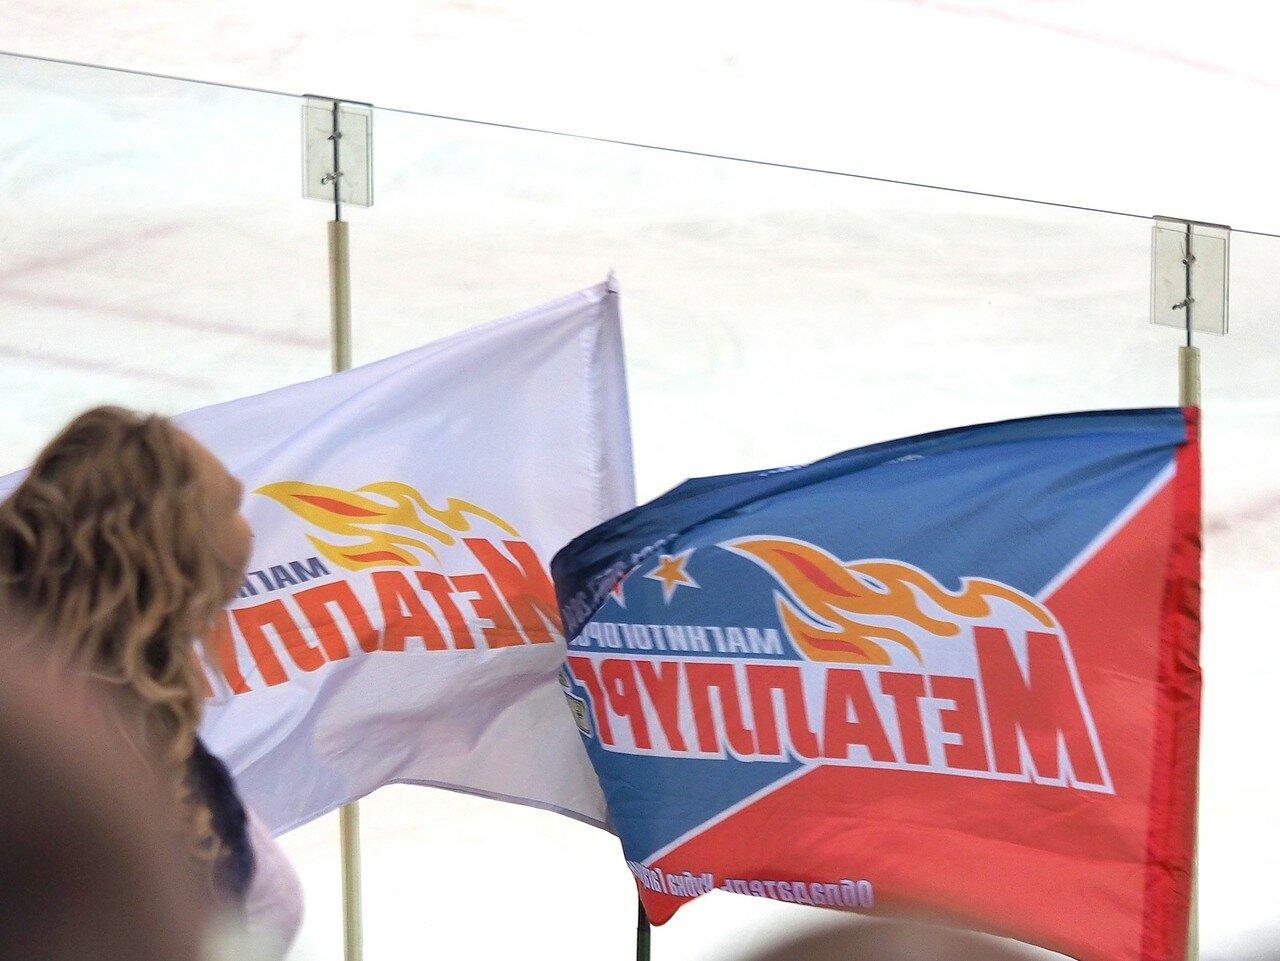 107Восток 1/2 плей-офф Металлург - Сибирь 08.03.2016